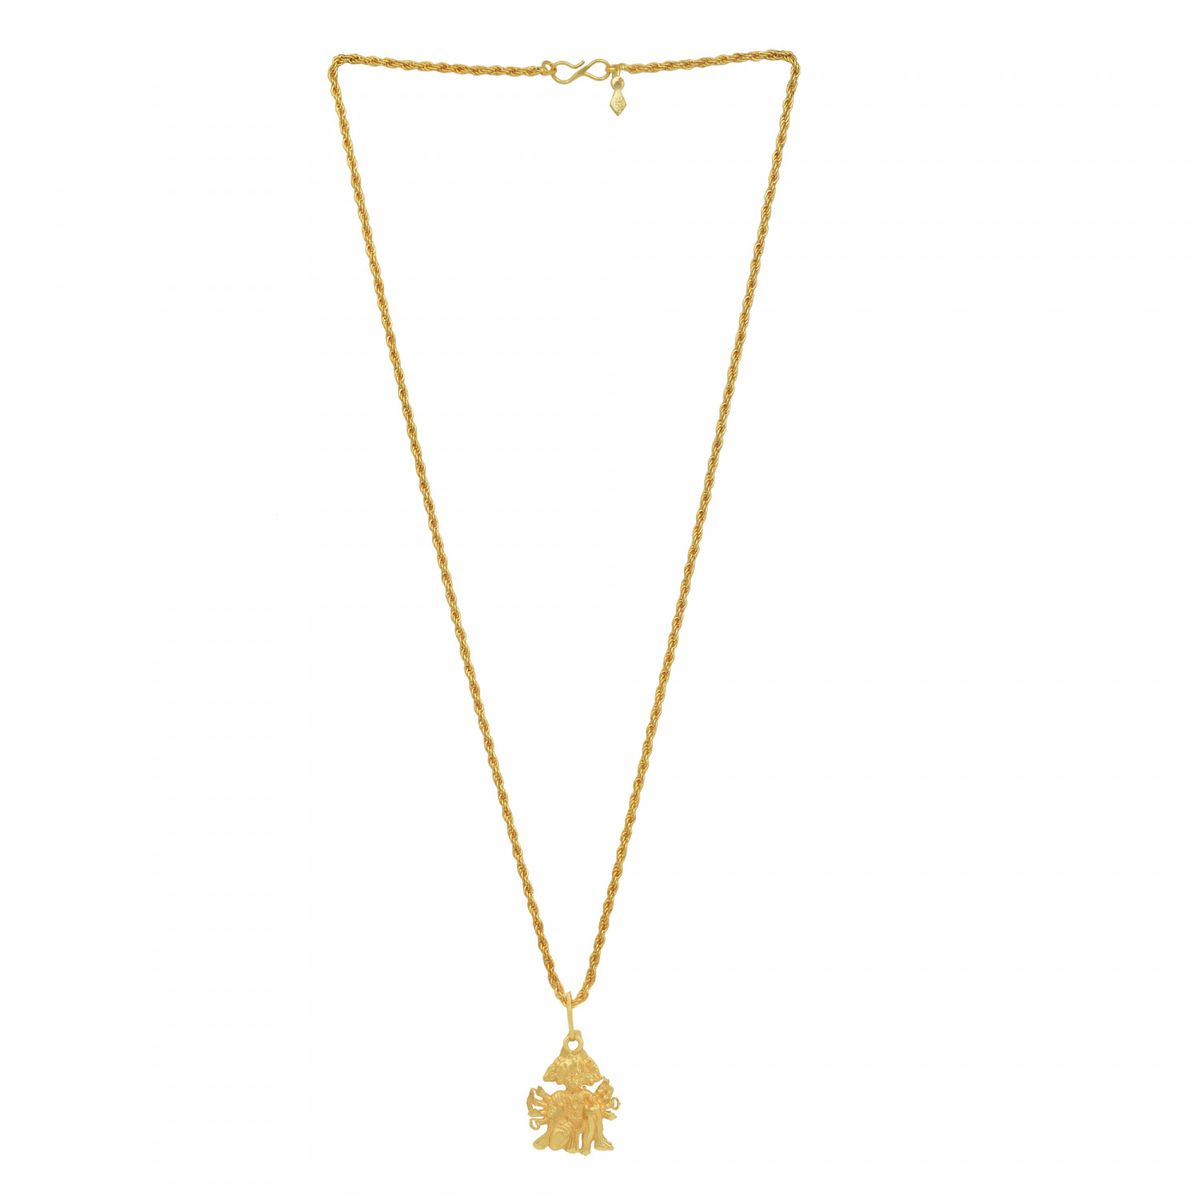 Buy memoir gold plated panchmukhi hanuman at lowest price memoir gold plated panchmukhi hanuman bajrang bali hindu god pendant temple jewellery chain pendant necklace jewellery aloadofball Images